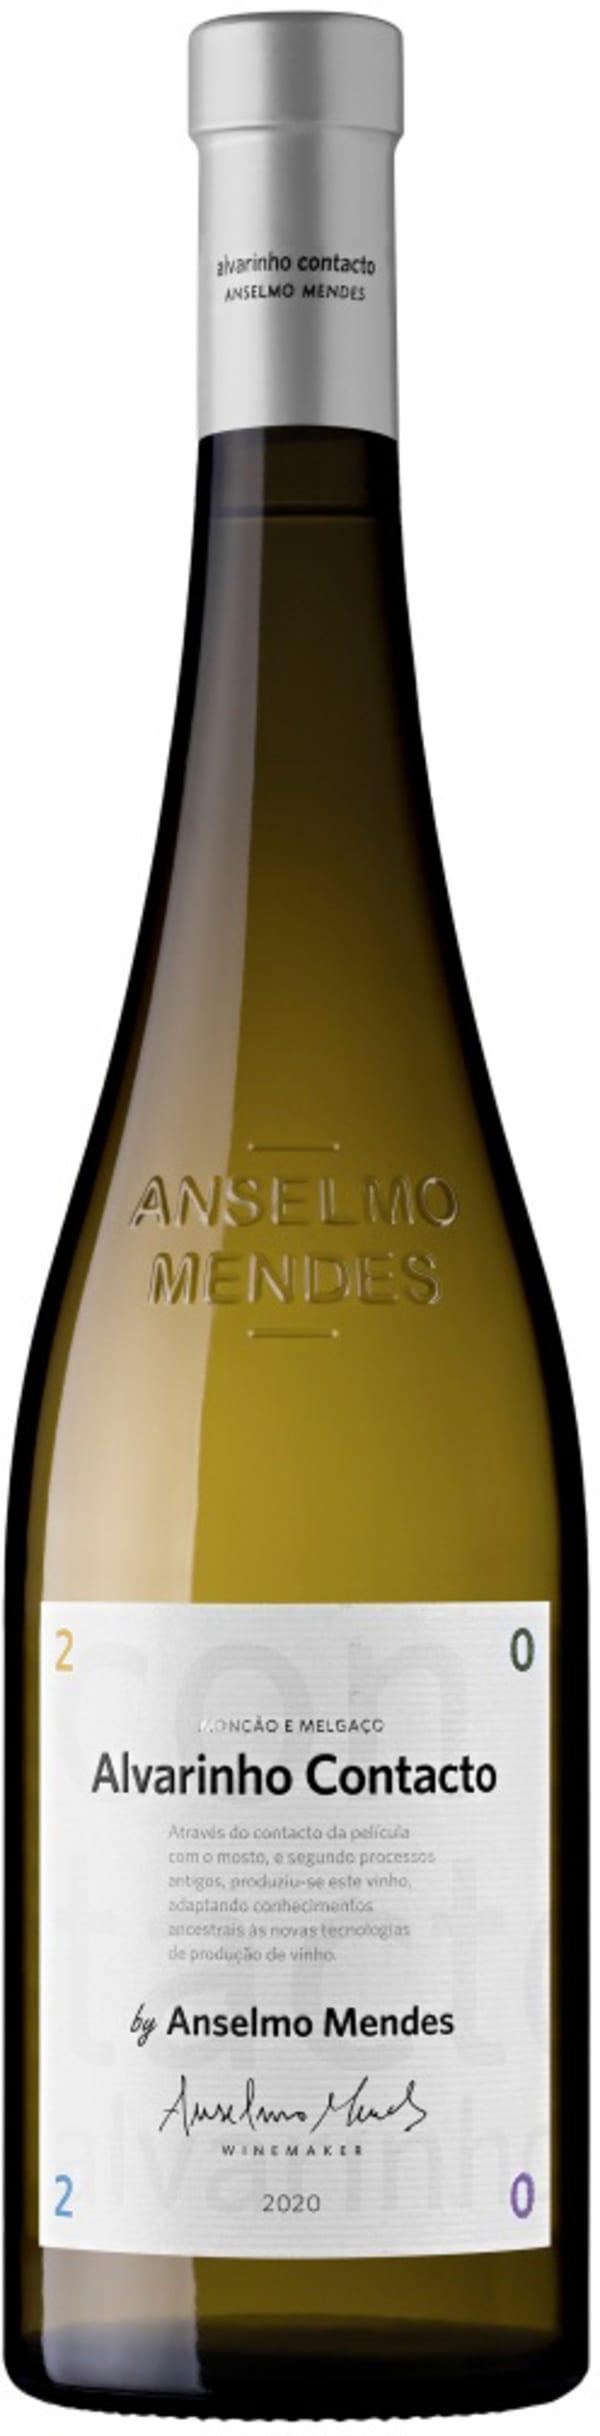 Anselmo Mendes Contacto Alvarinho 2020